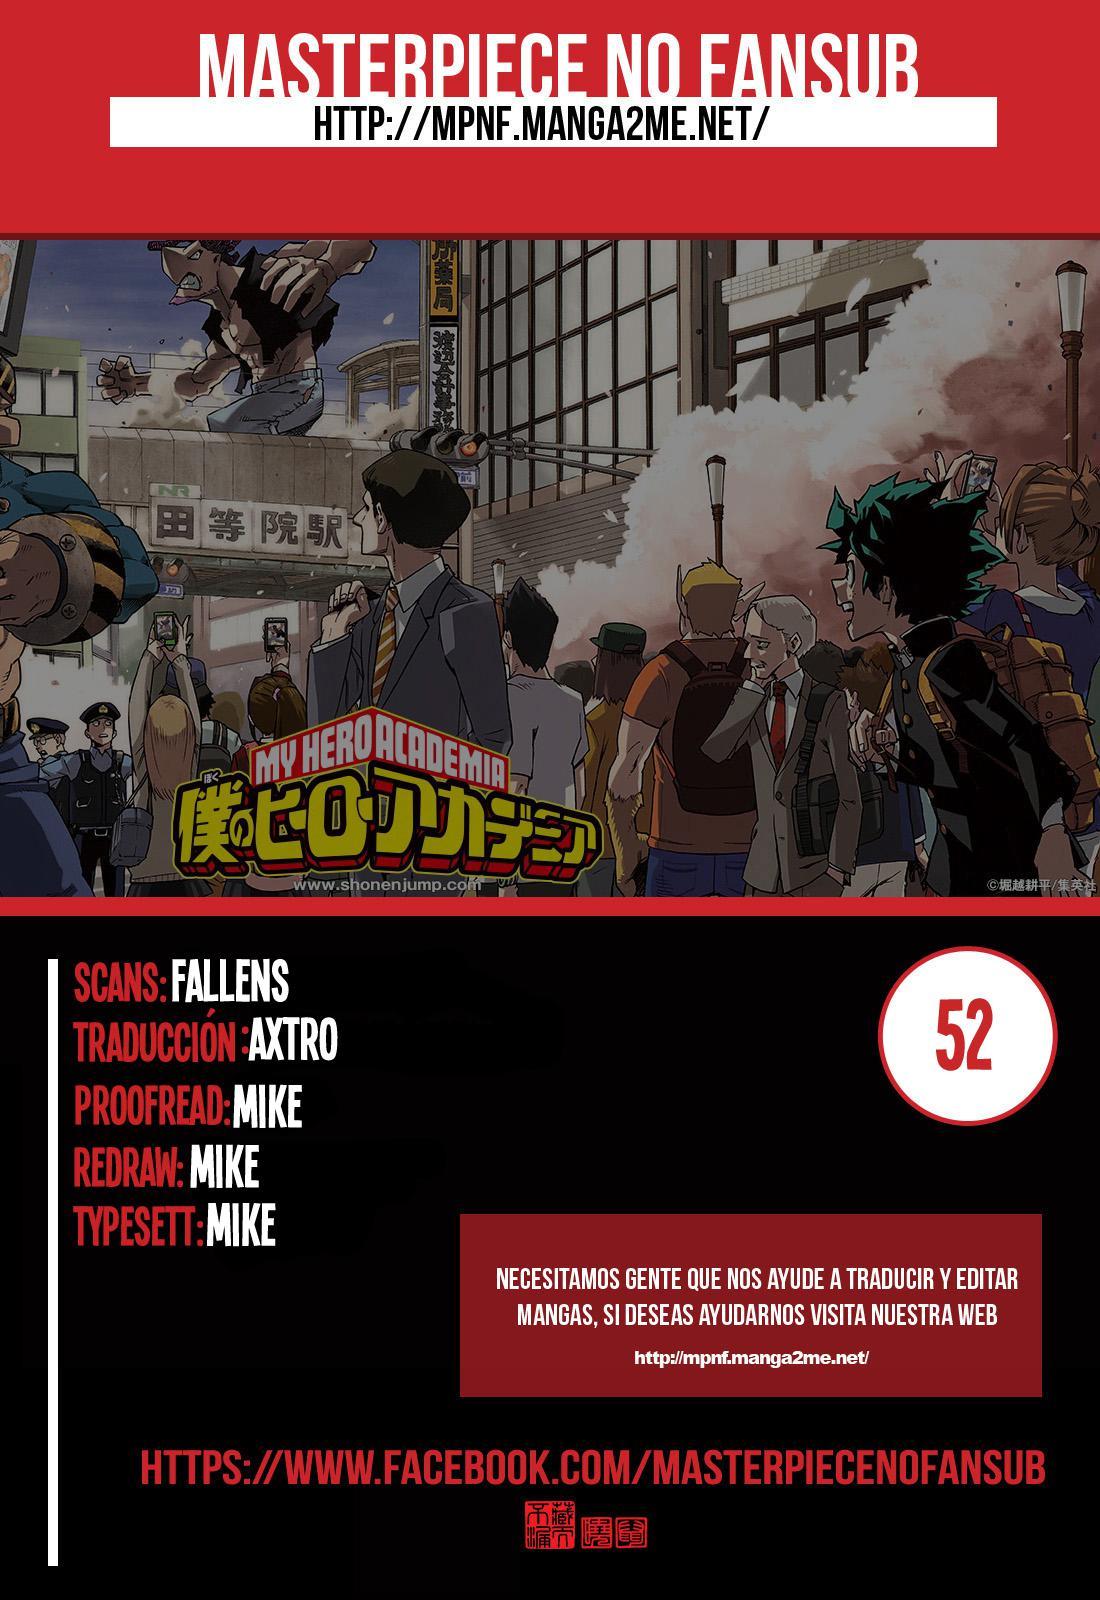 http://c5.ninemanga.com/es_manga/54/182/391303/5ecf438e3ba6480cc3a438114d08f6c5.jpg Page 1